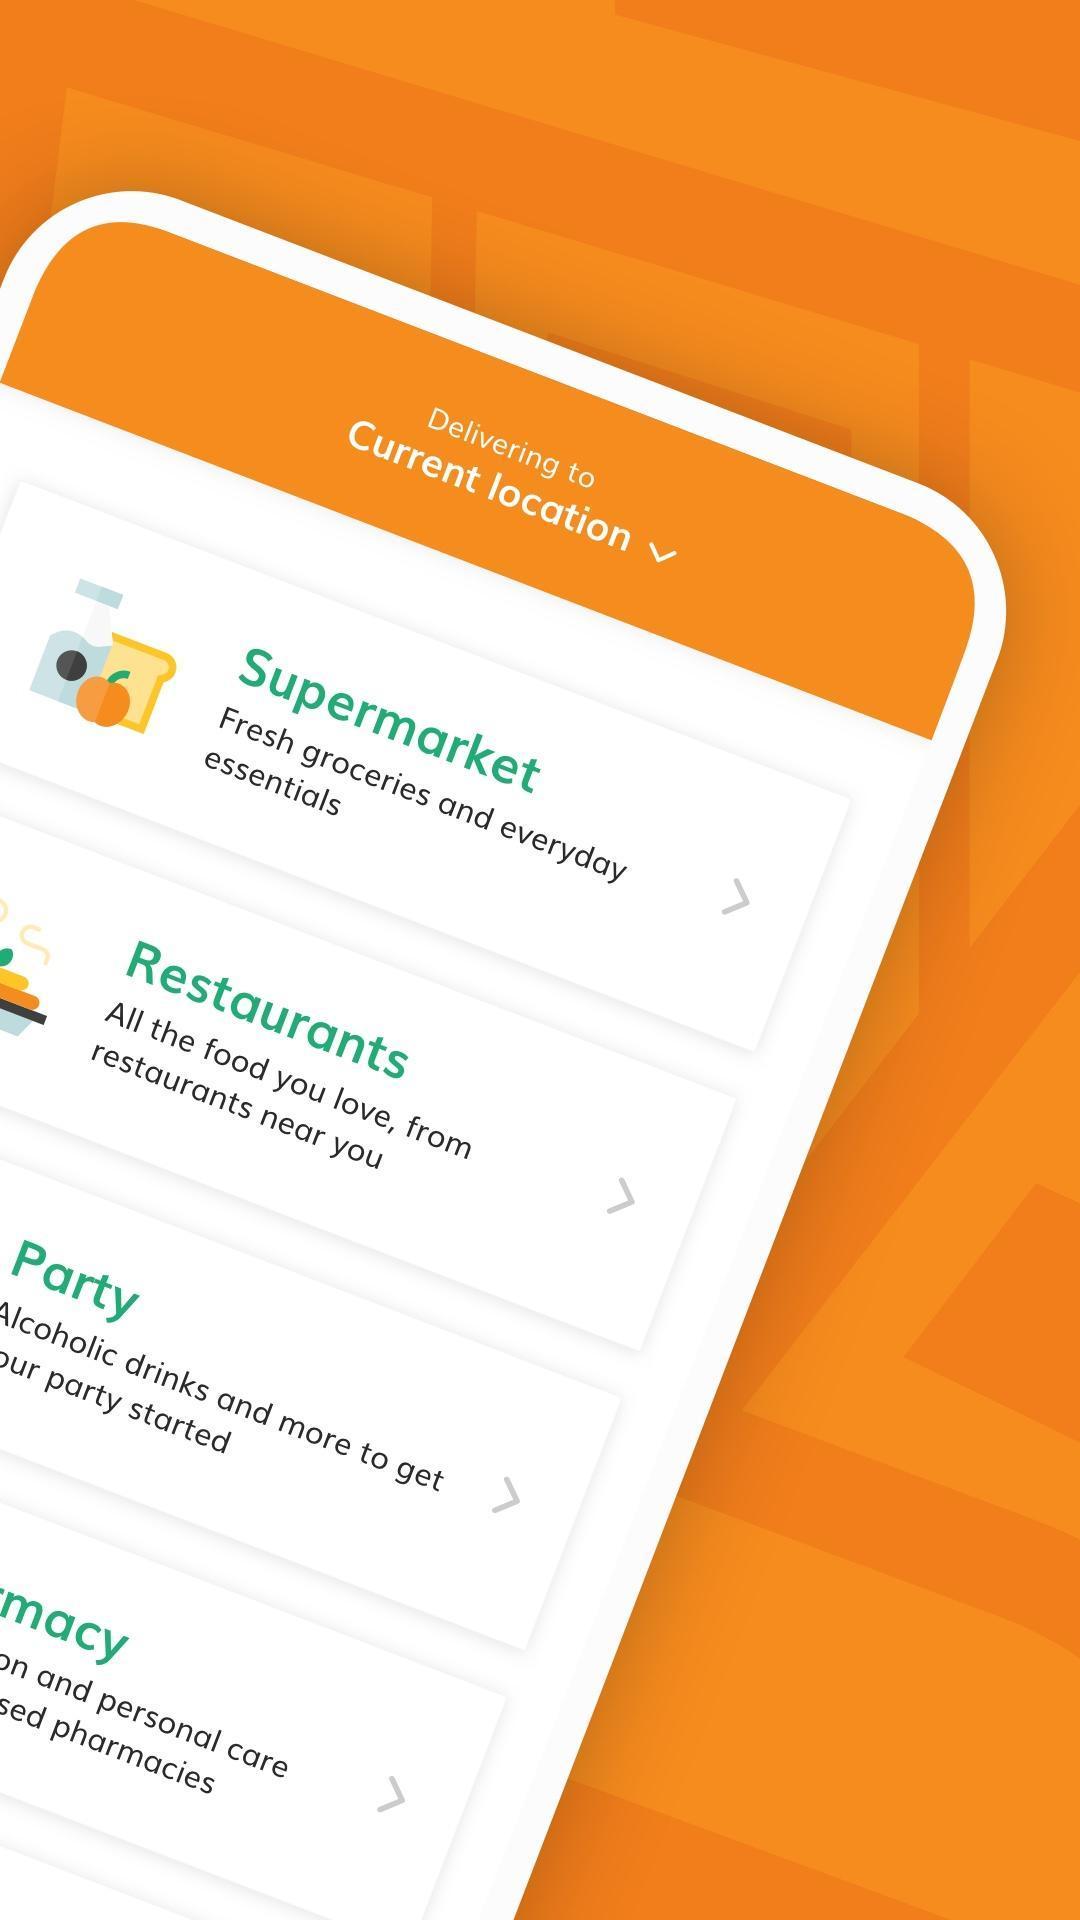 Jumia Food Local Food Delivery near You 4.3.1 Screenshot 2